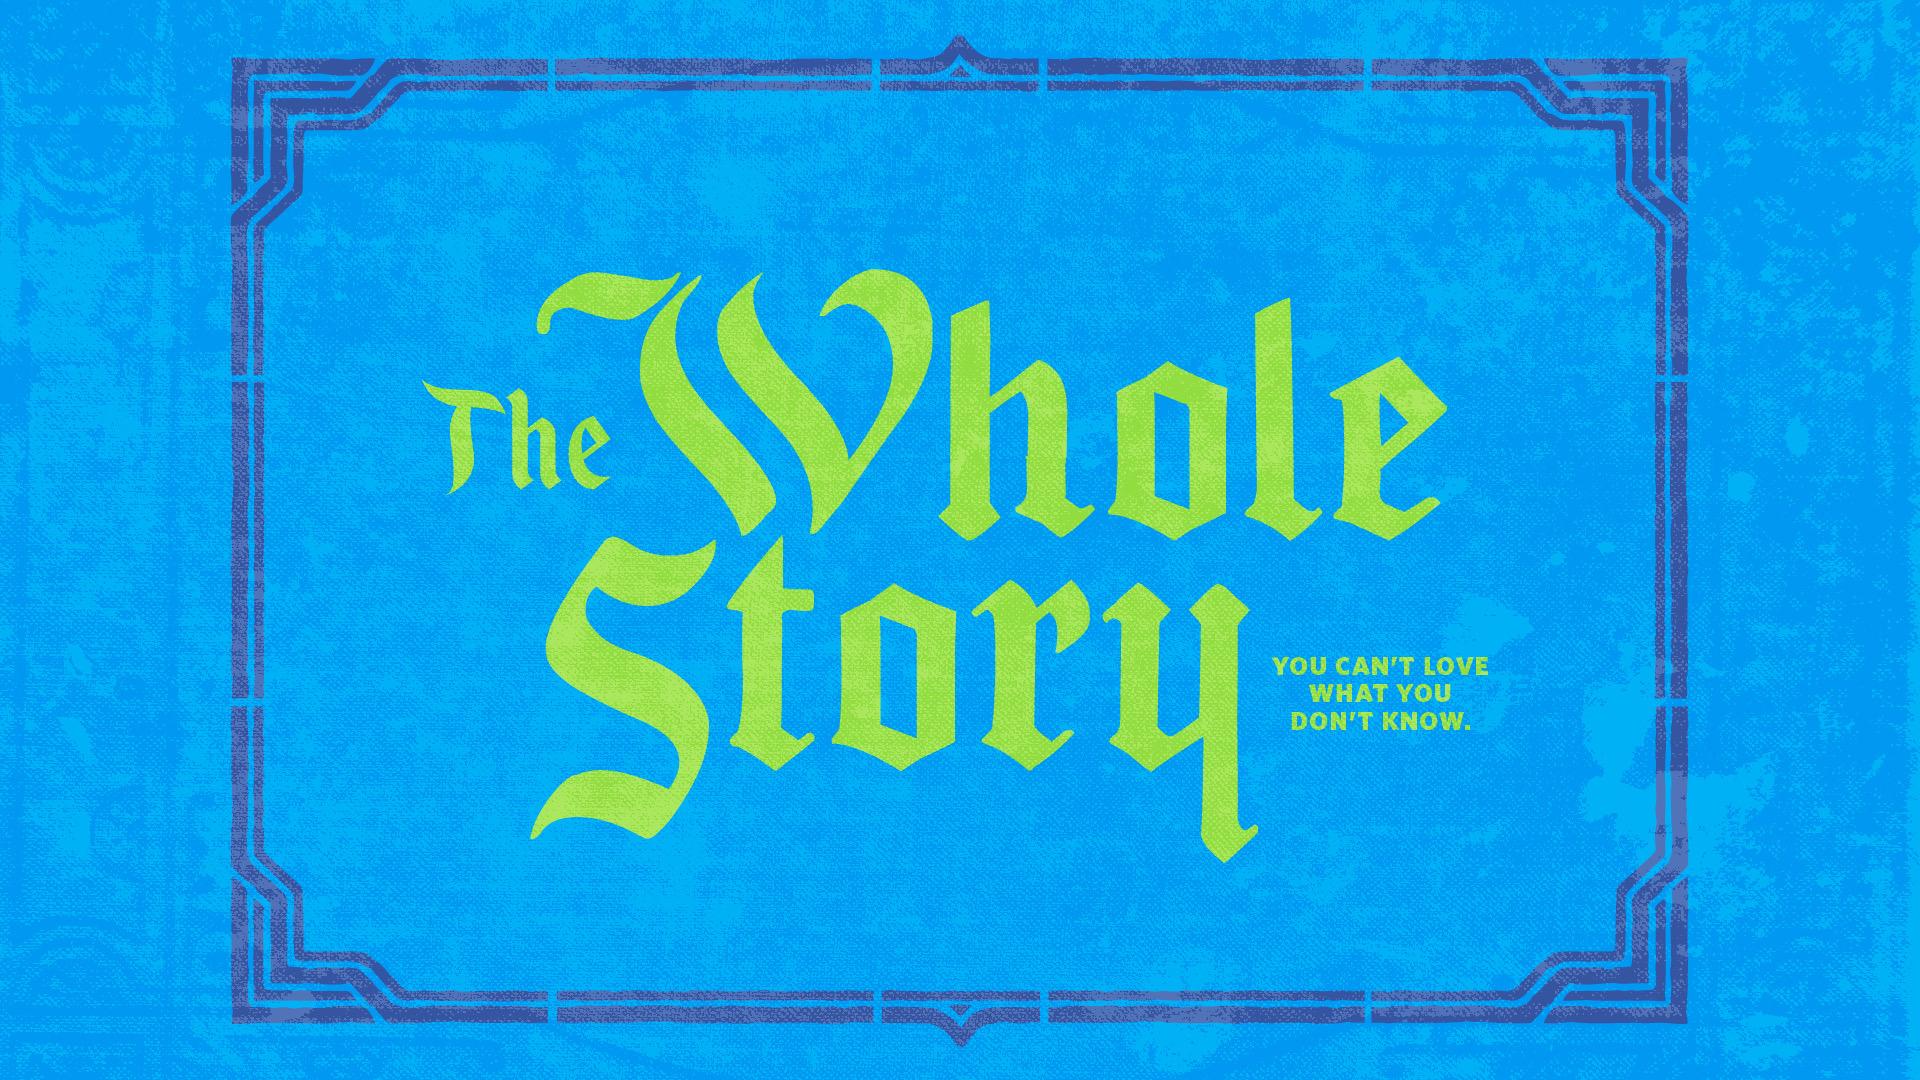 TheWholeStory_Slide.jpeg